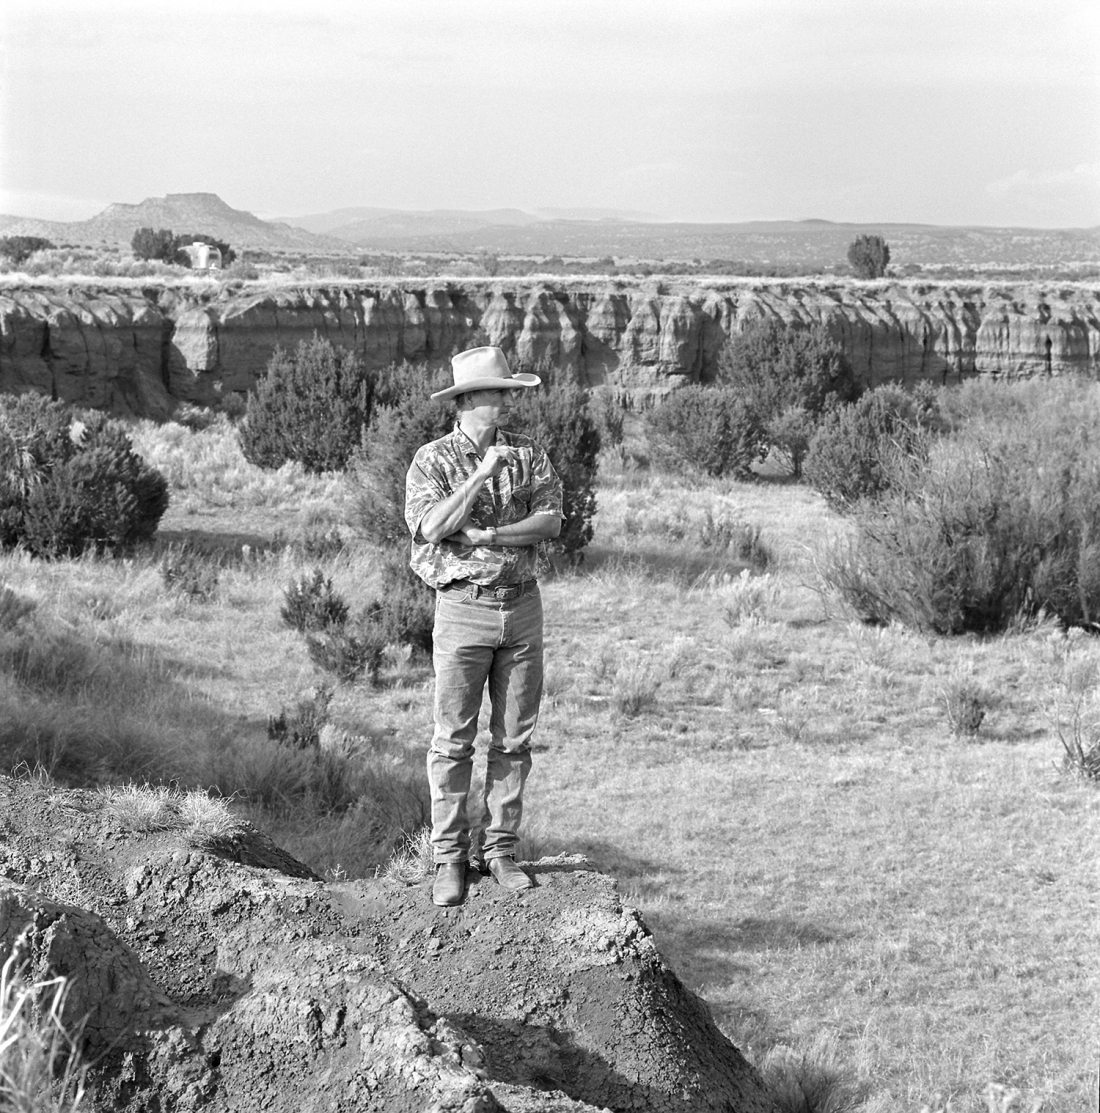 Laura Wilson, Bruce Nauman, Galisteo, New Mexico, May 26, 1998